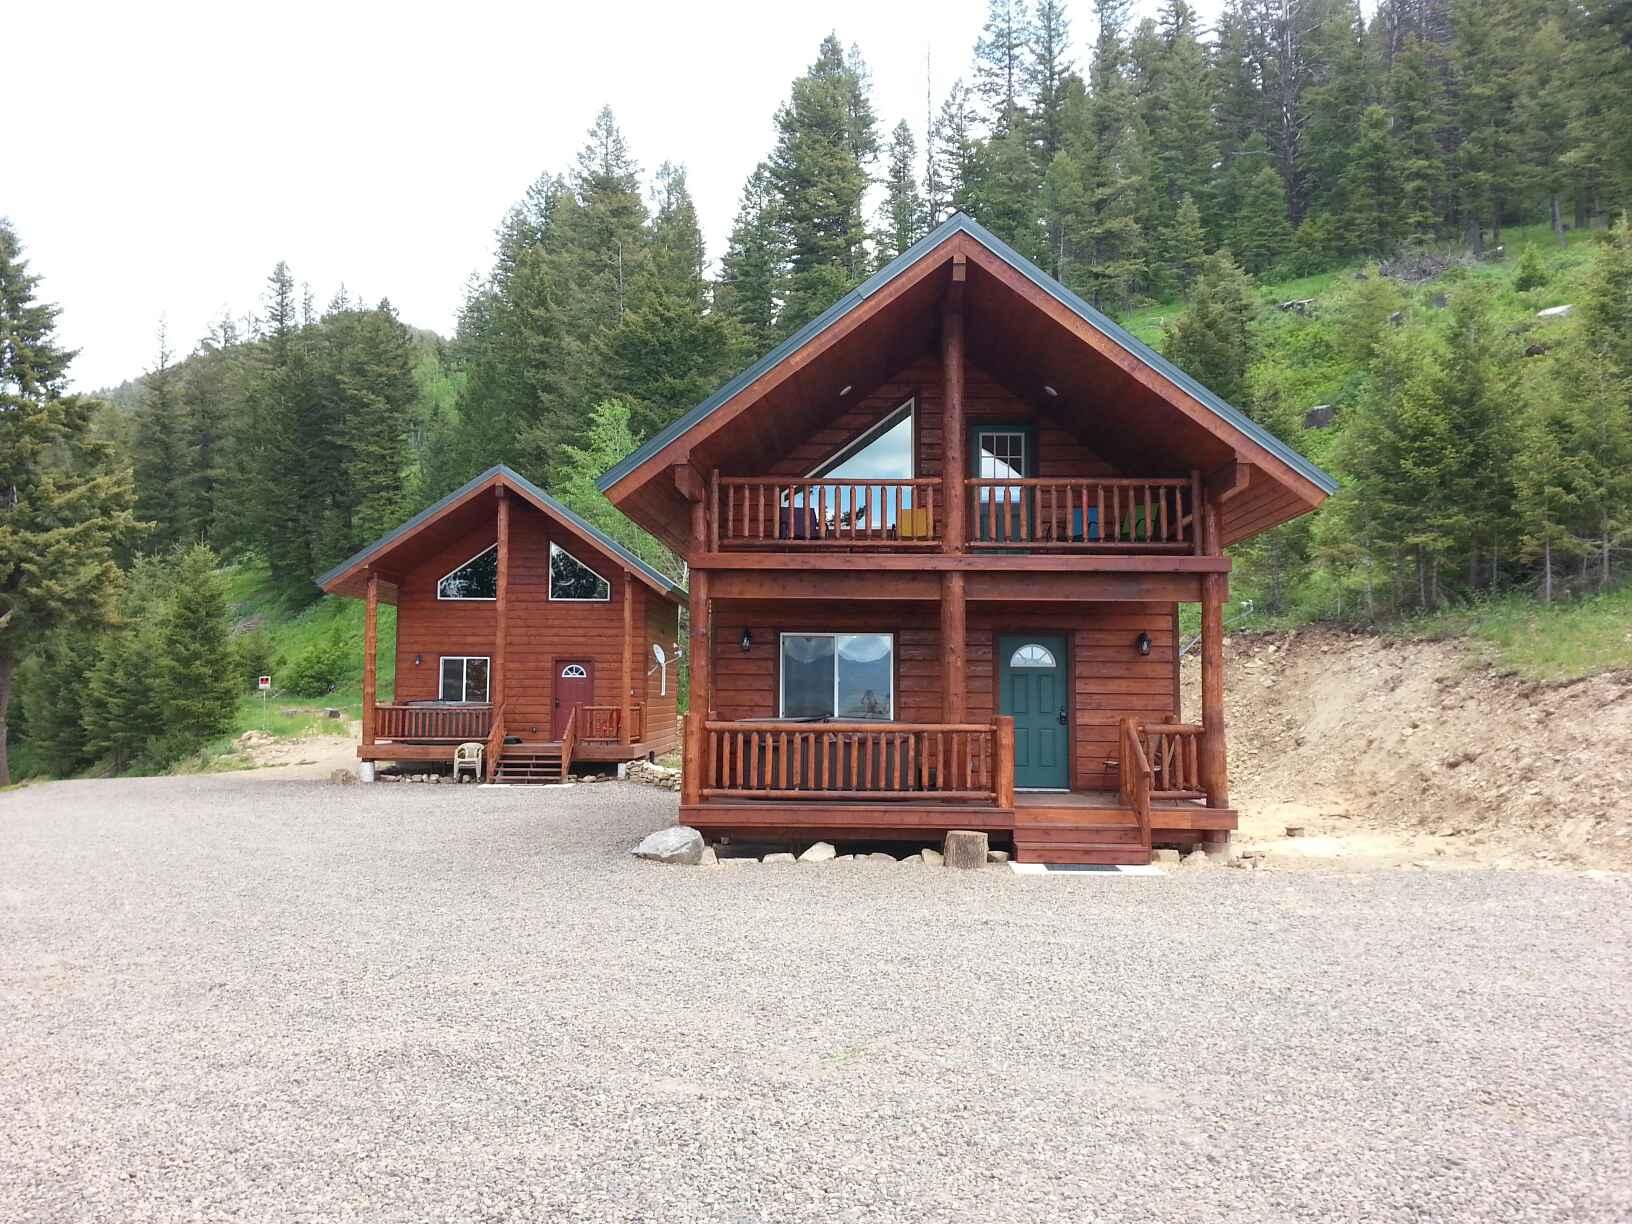 park cabins image idaho retreat island cabin yellowstone rentals